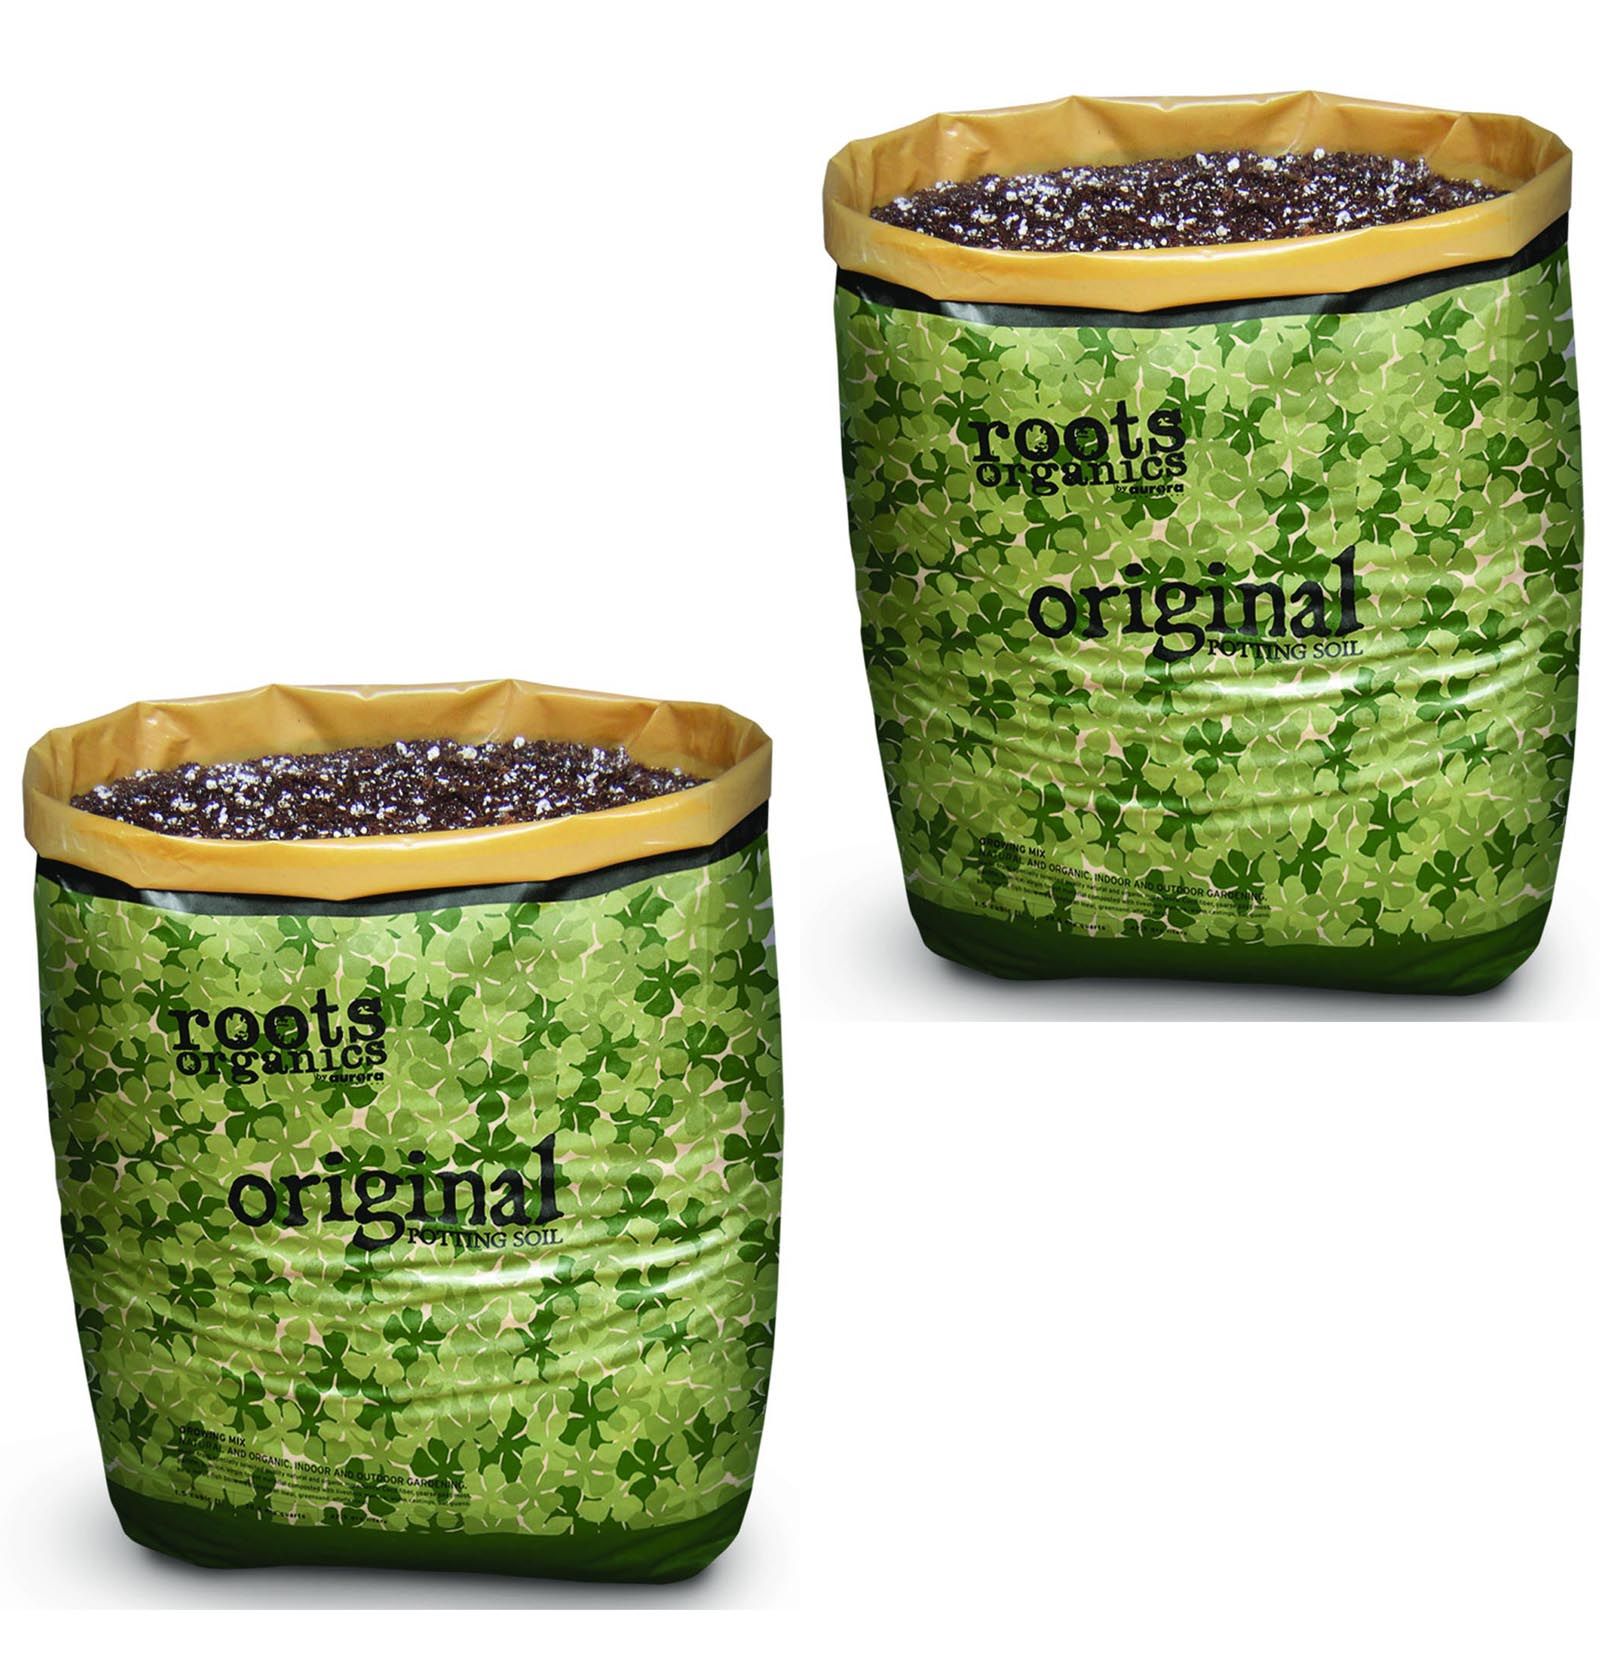 (2) Roots Organics Gardening Coco Fiber-Based Potting Soi...